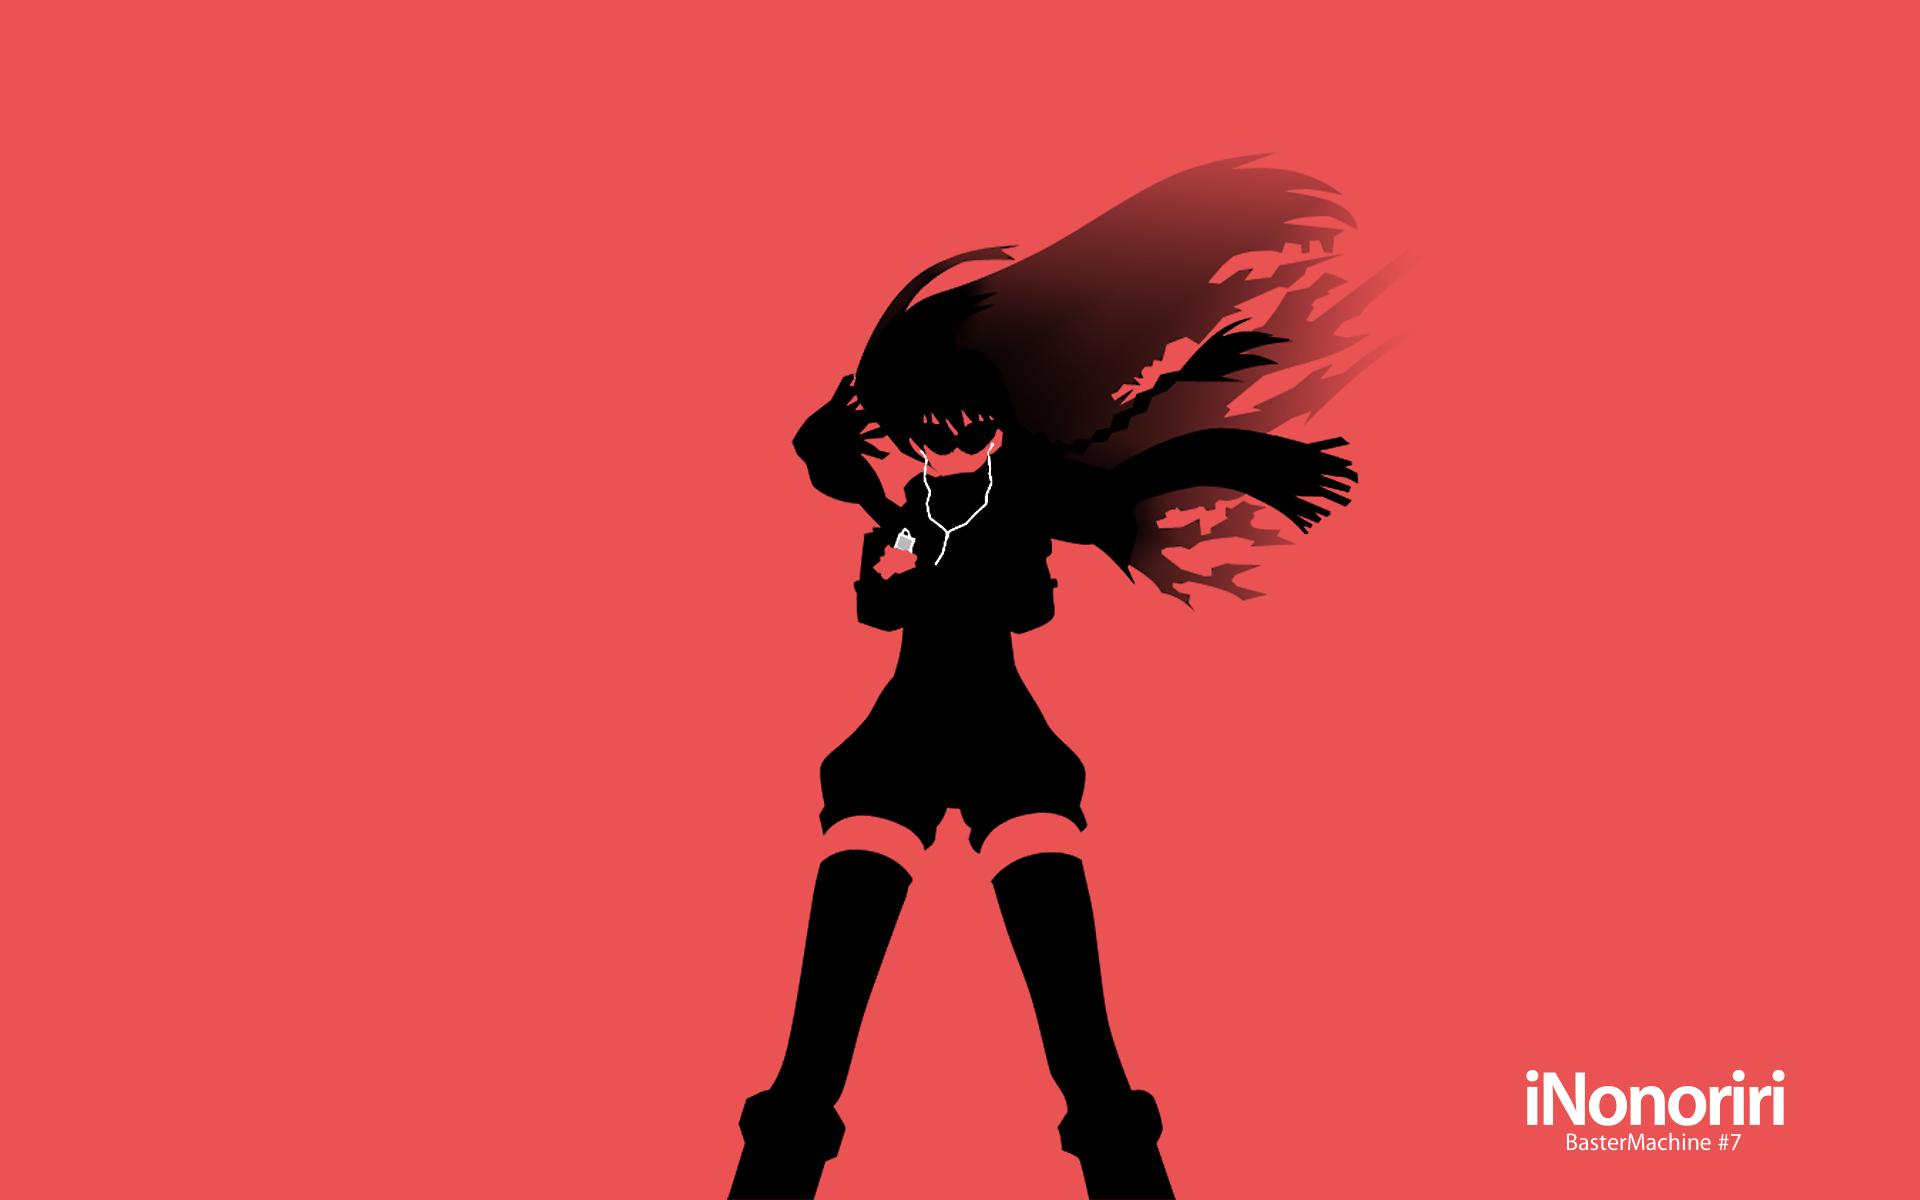 diebuster ipod parody polychromatic silhouette